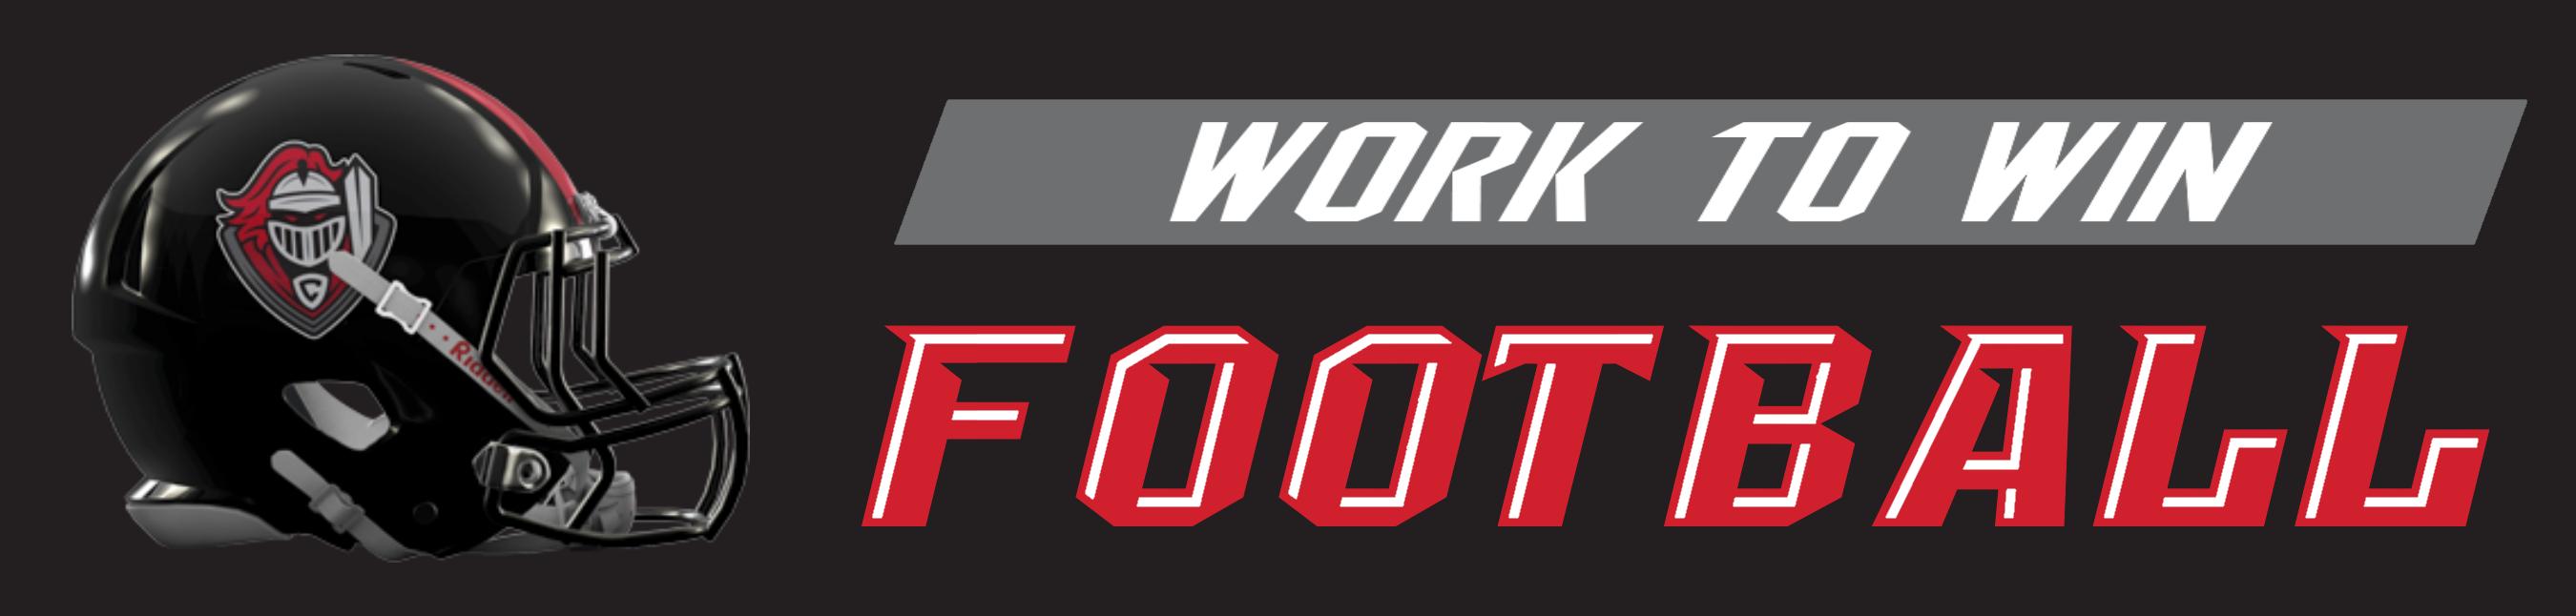 WorK to Win Football